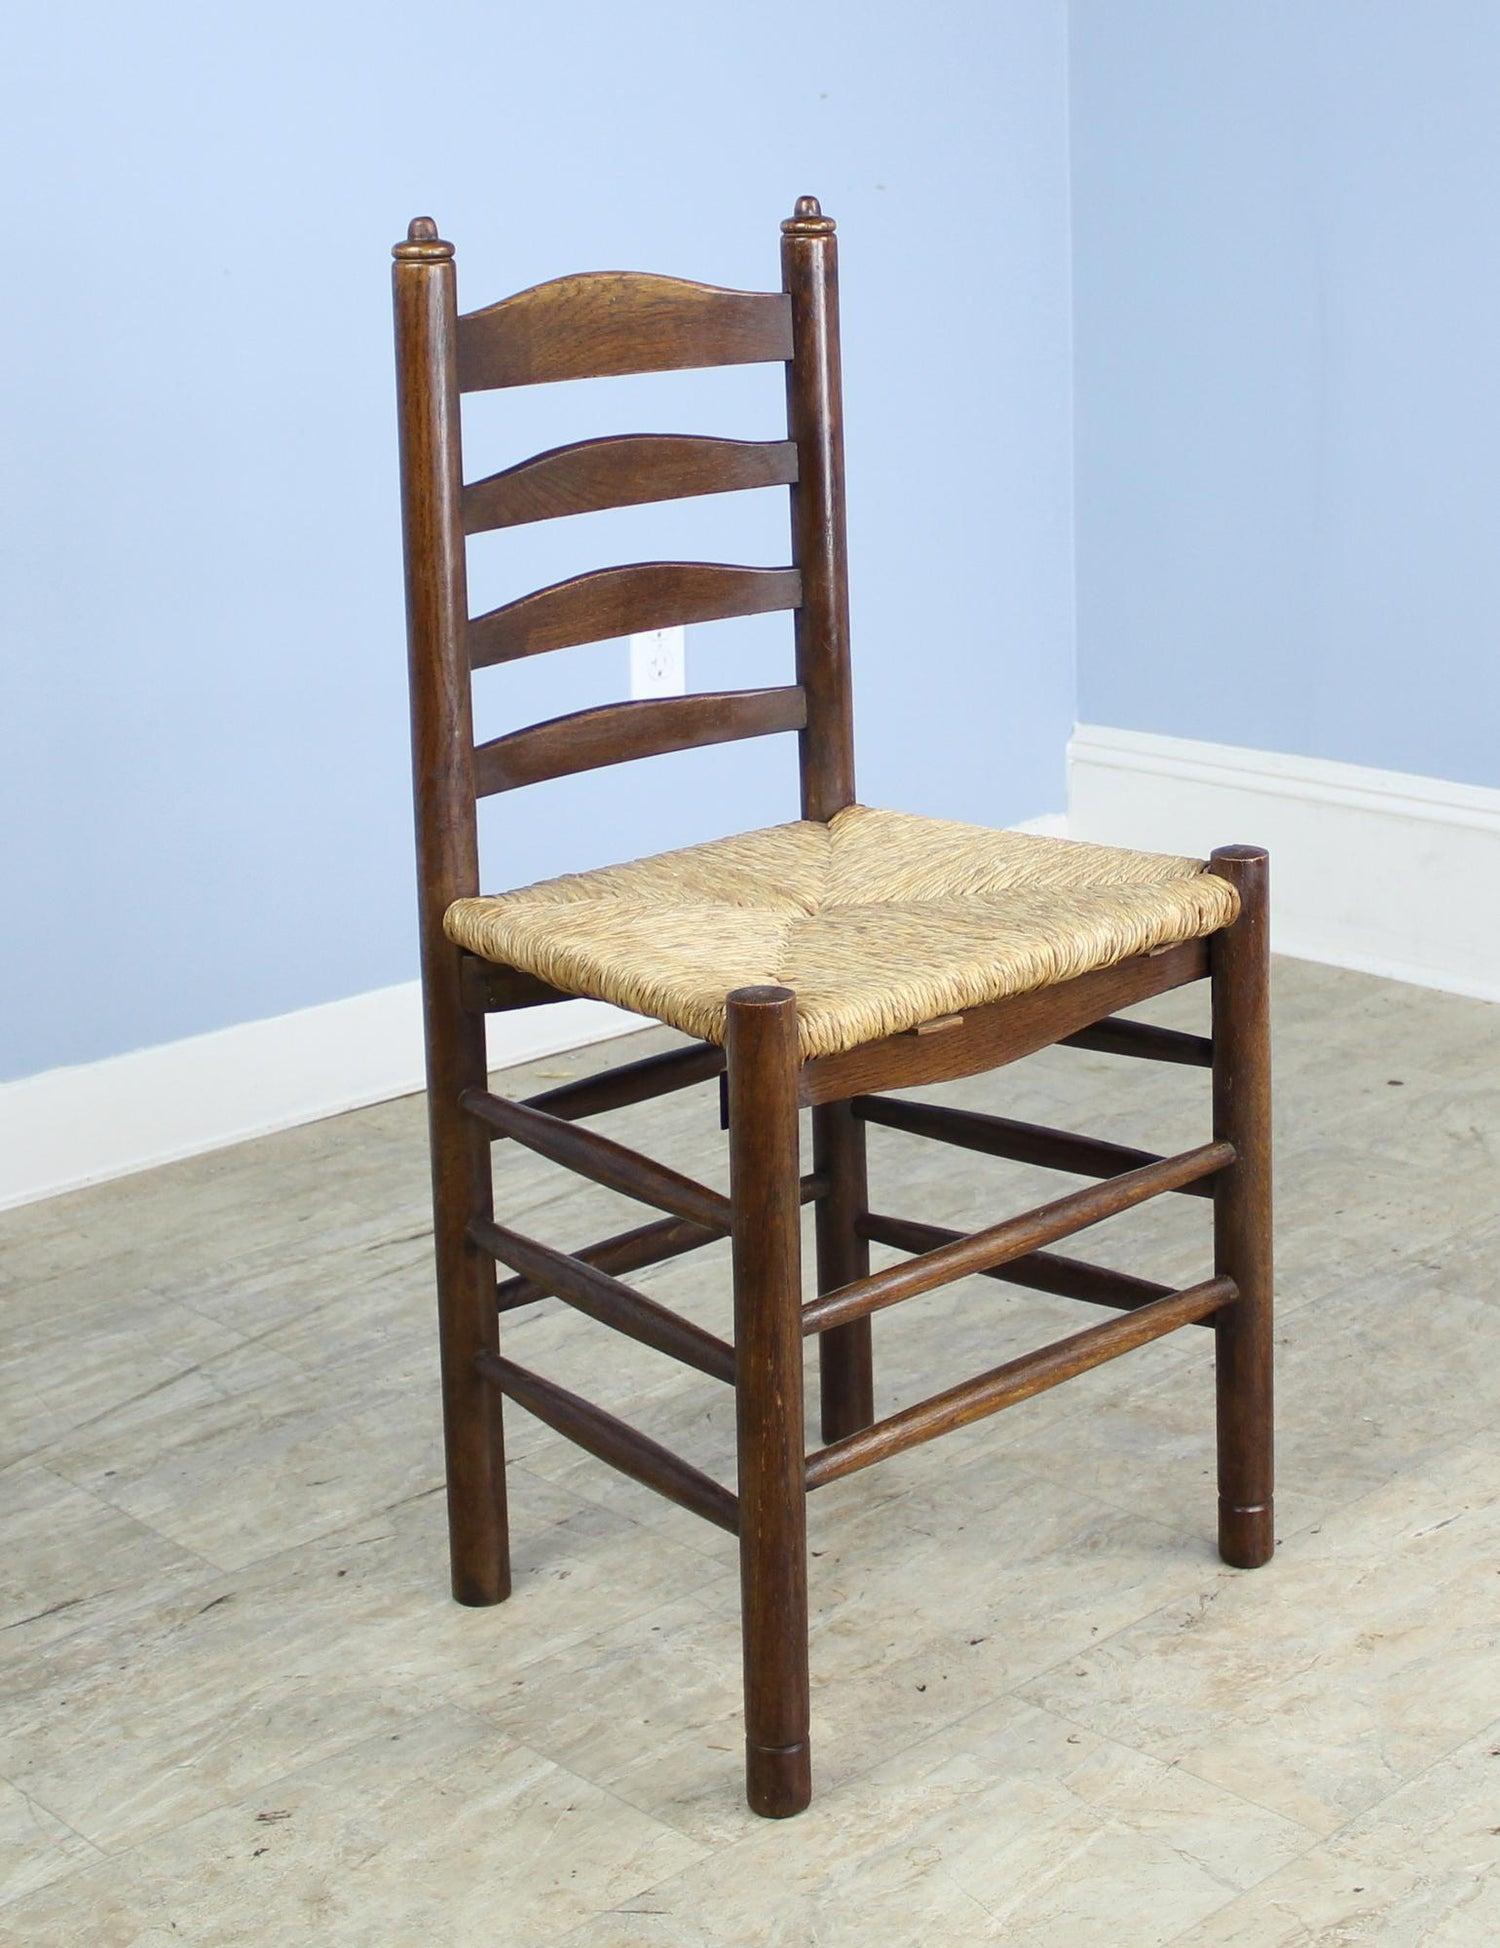 church chairs for sale near me